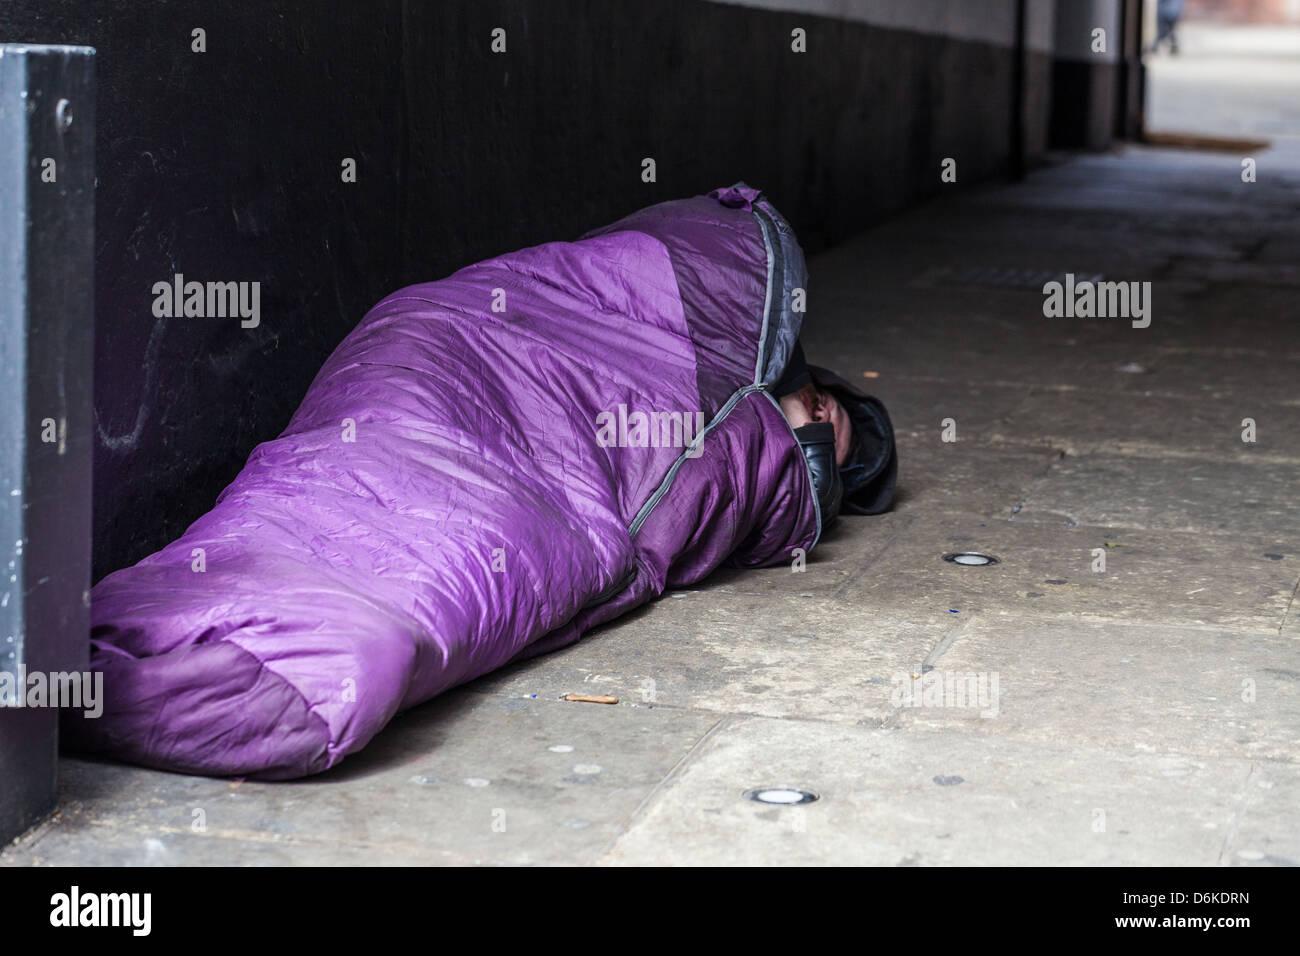 Homeless man sleeping rough in a sleeping bag, London, England, UK. - Stock Image